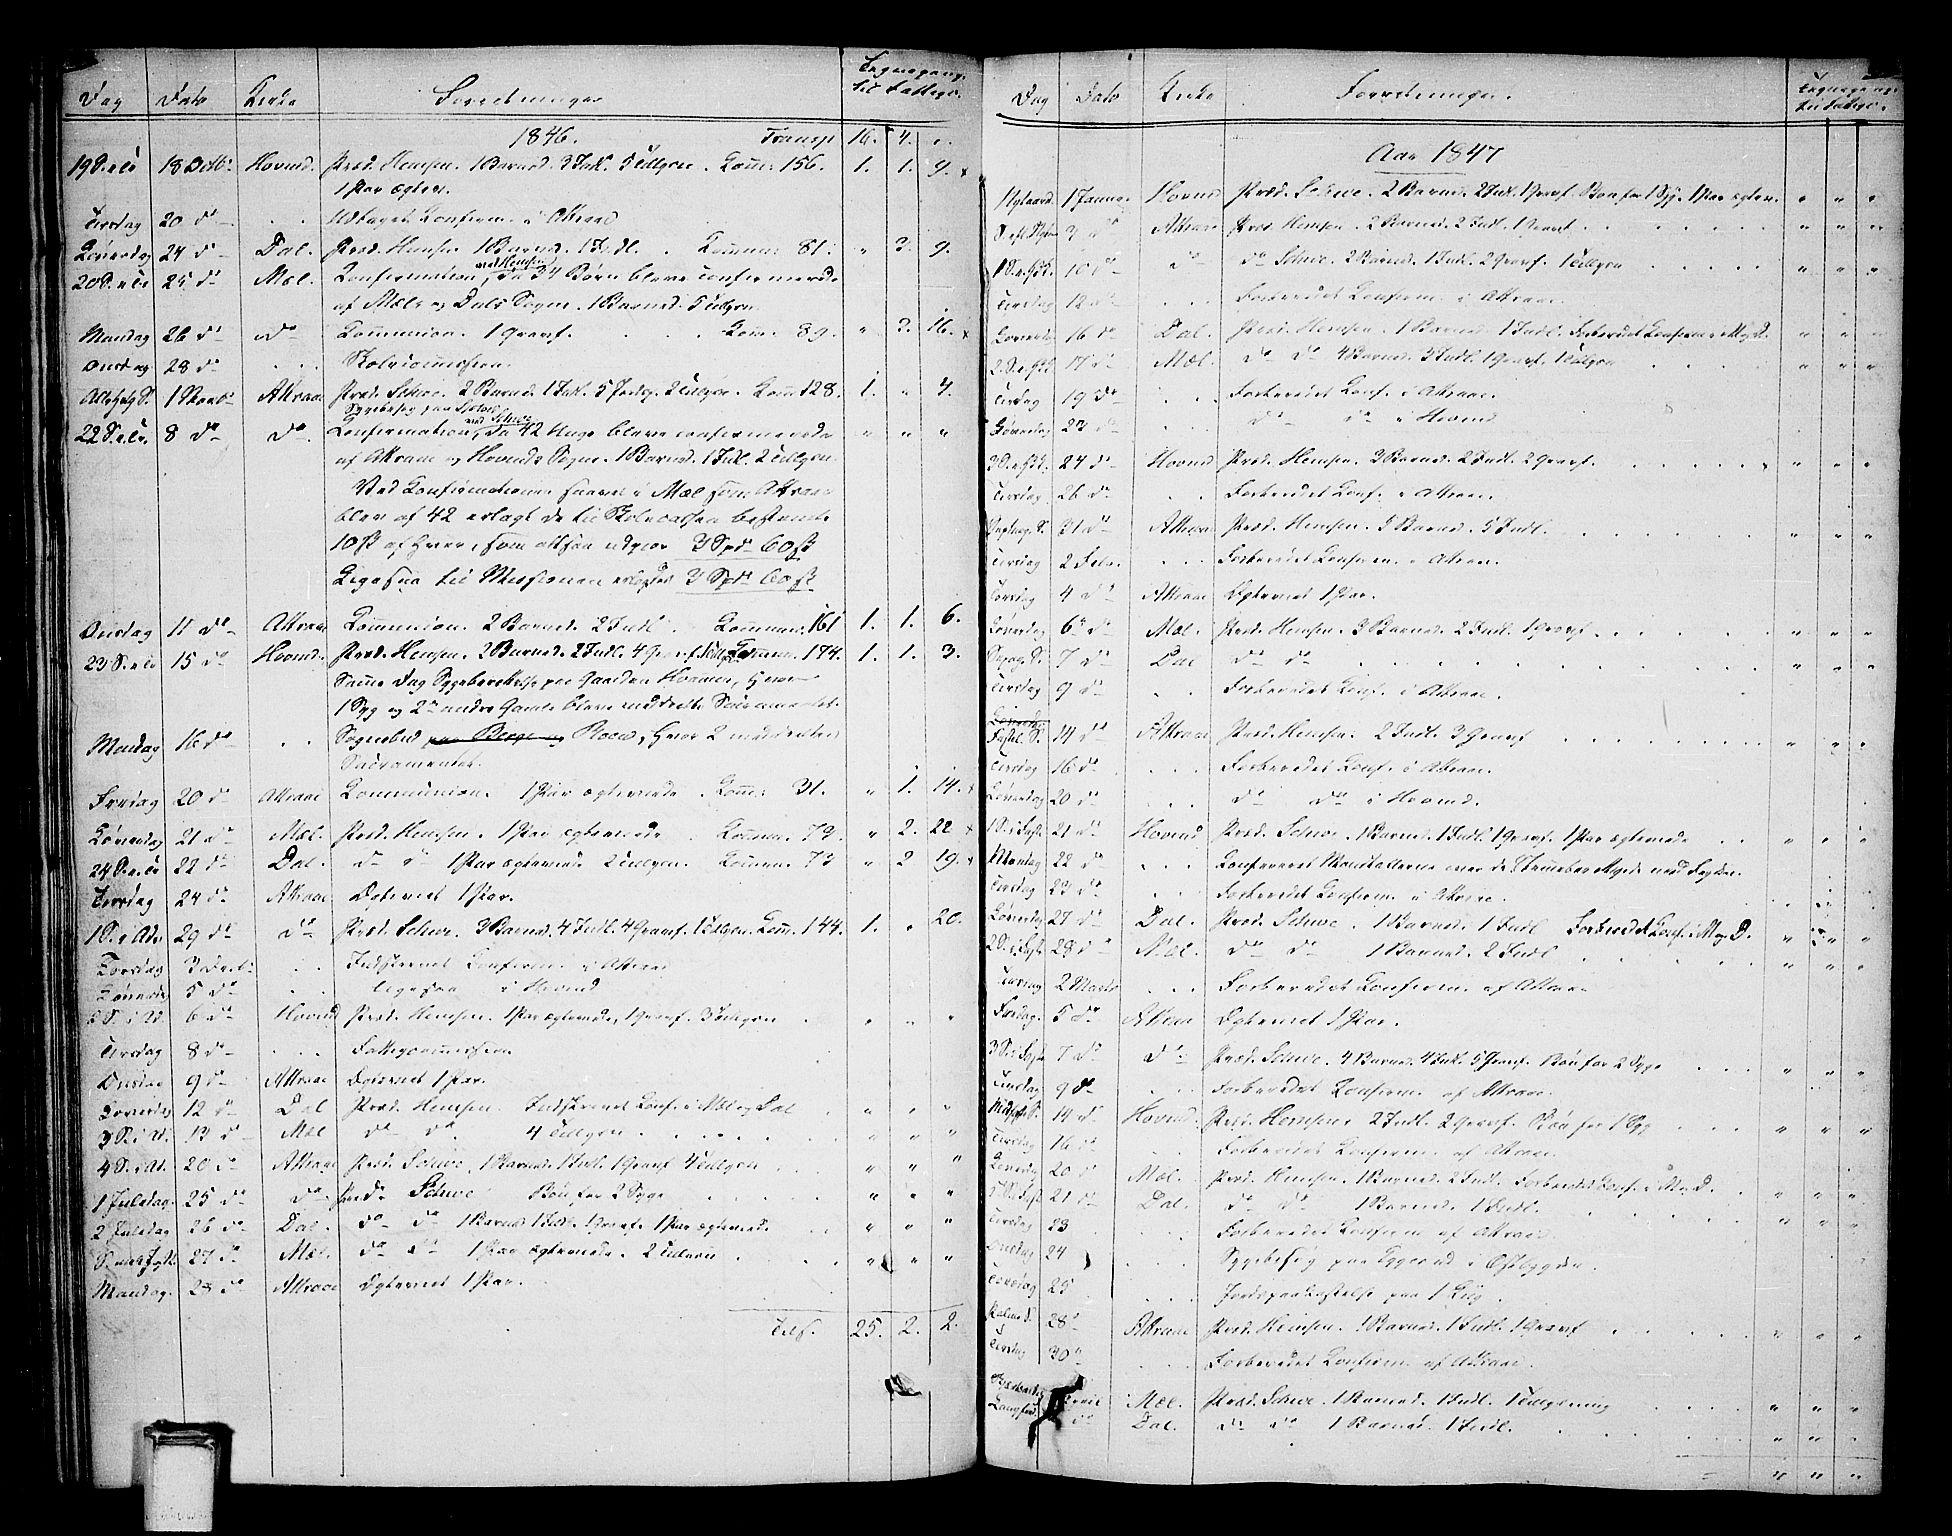 SAKO, Tinn kirkebøker, F/Fa/L0003: Ministerialbok nr. I 3, 1810-1814, s. 190-191